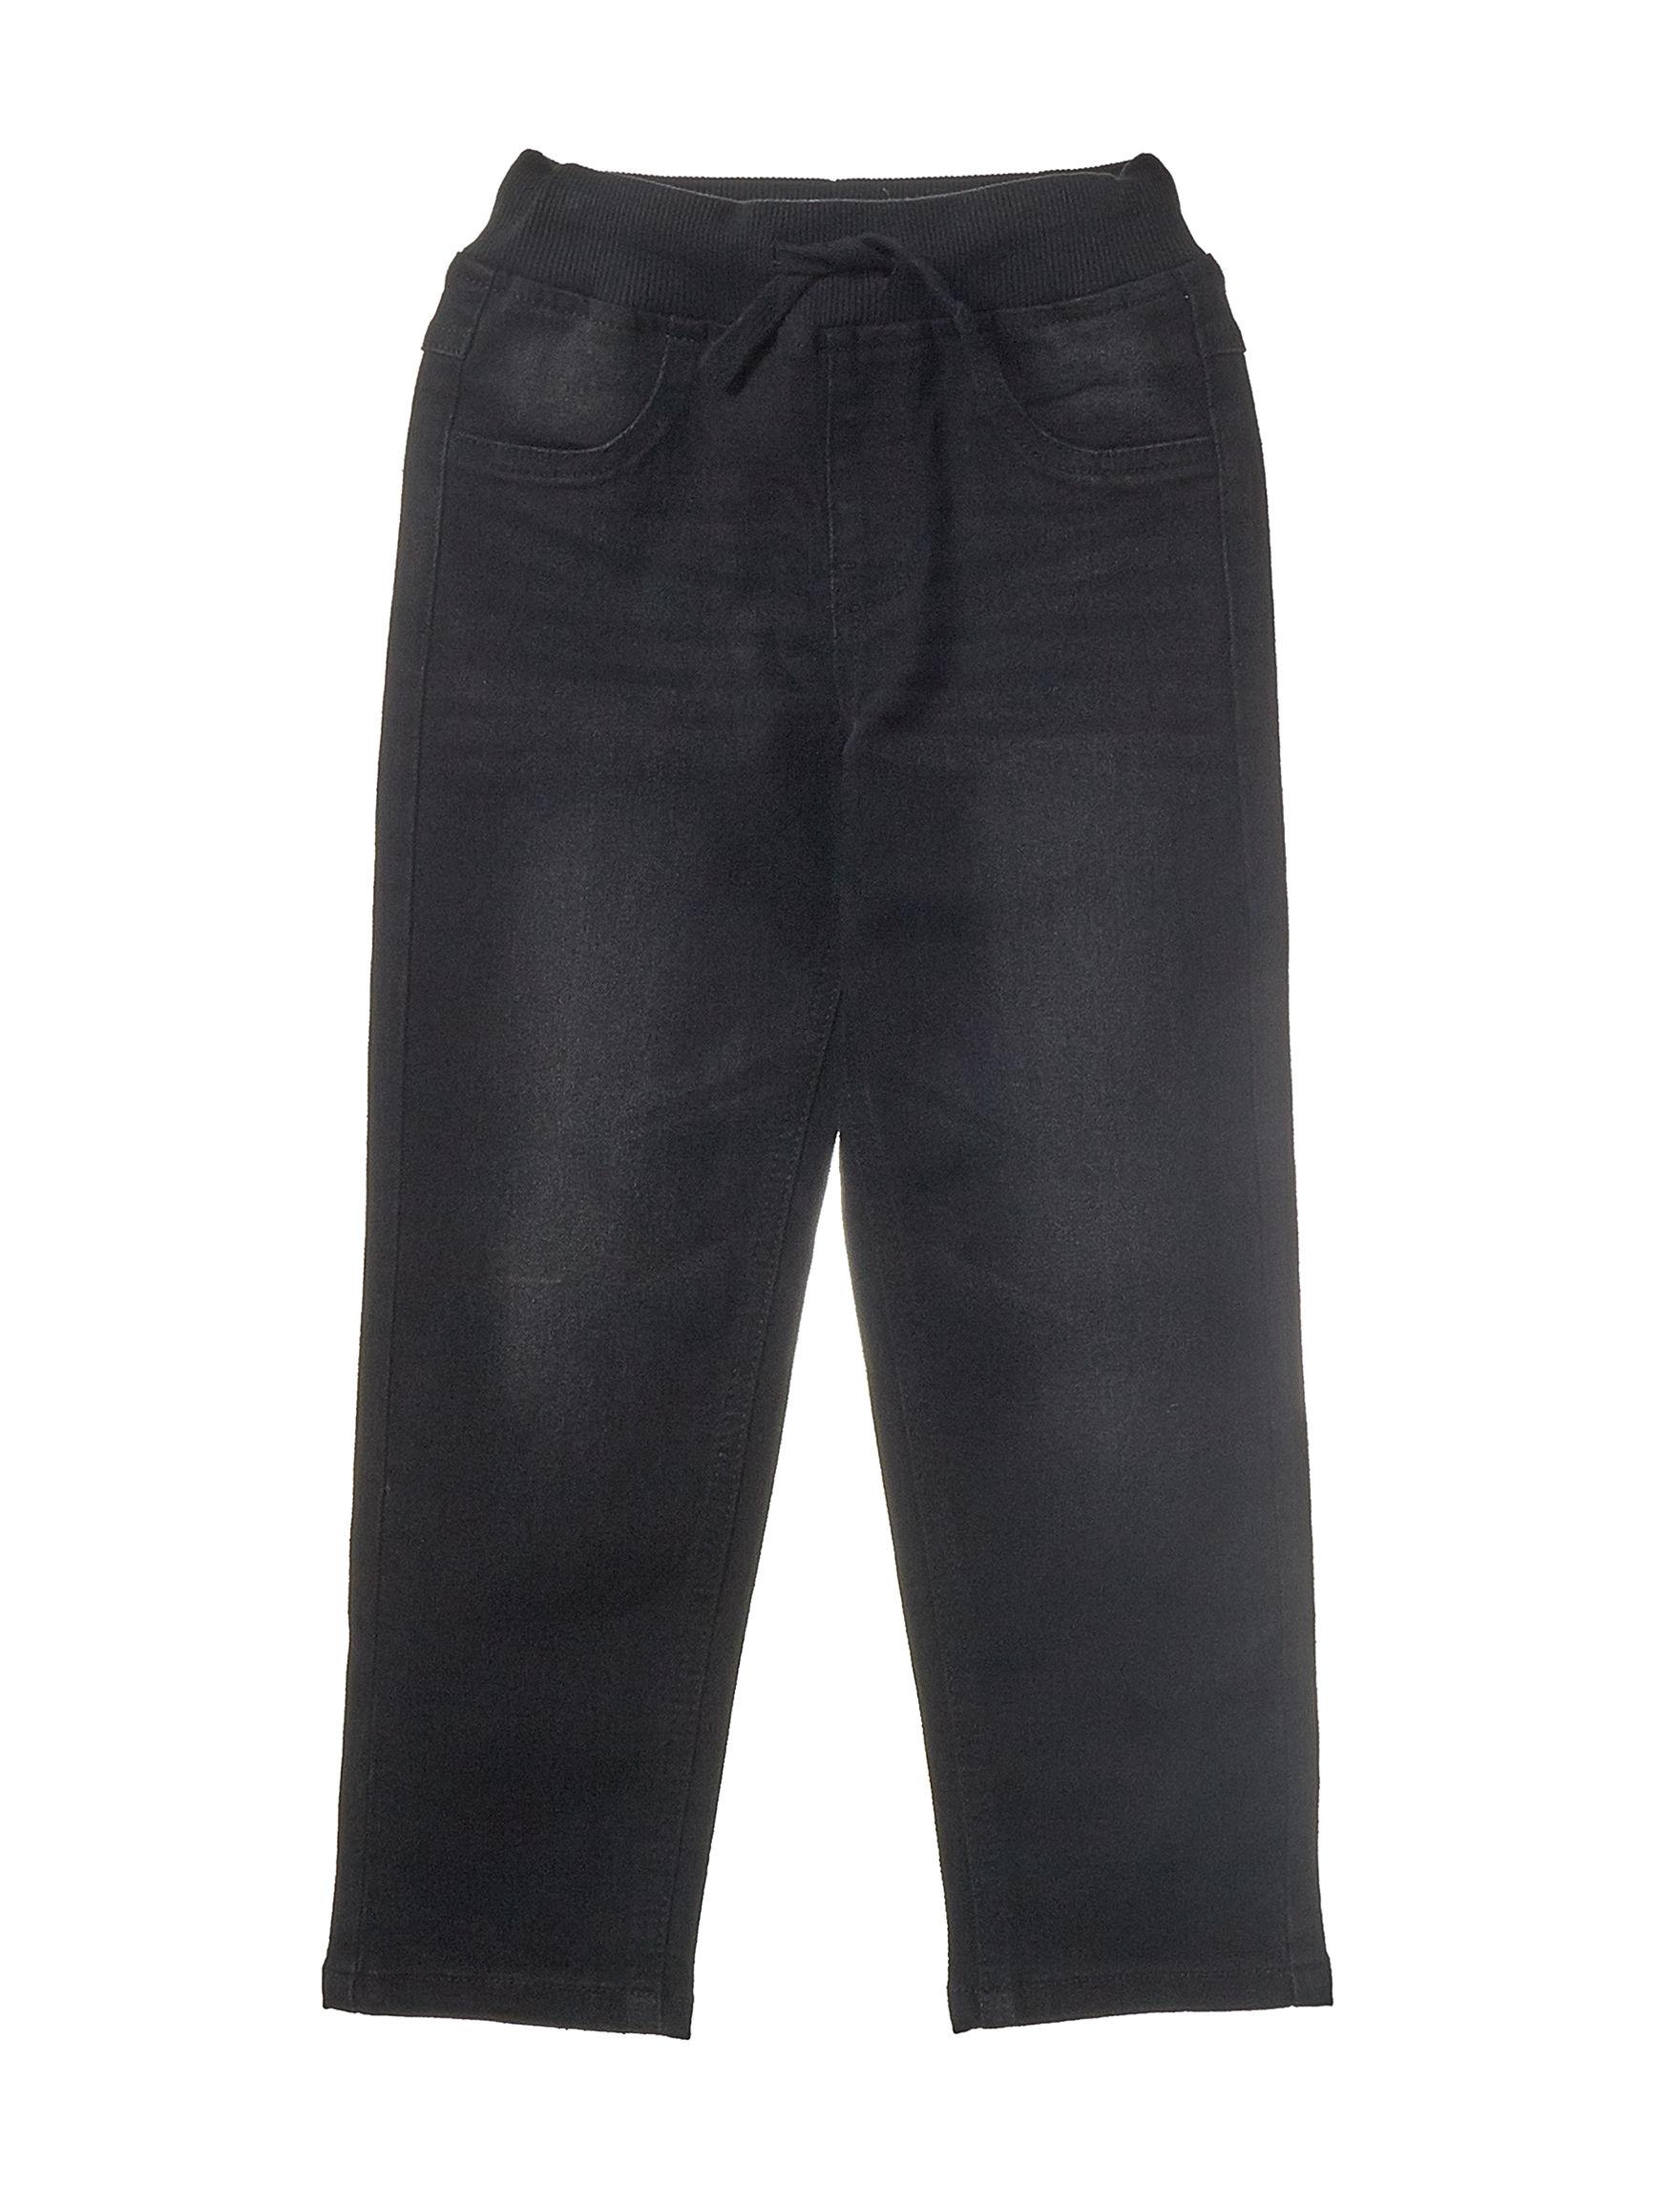 Hollywood Jeans Black Wash